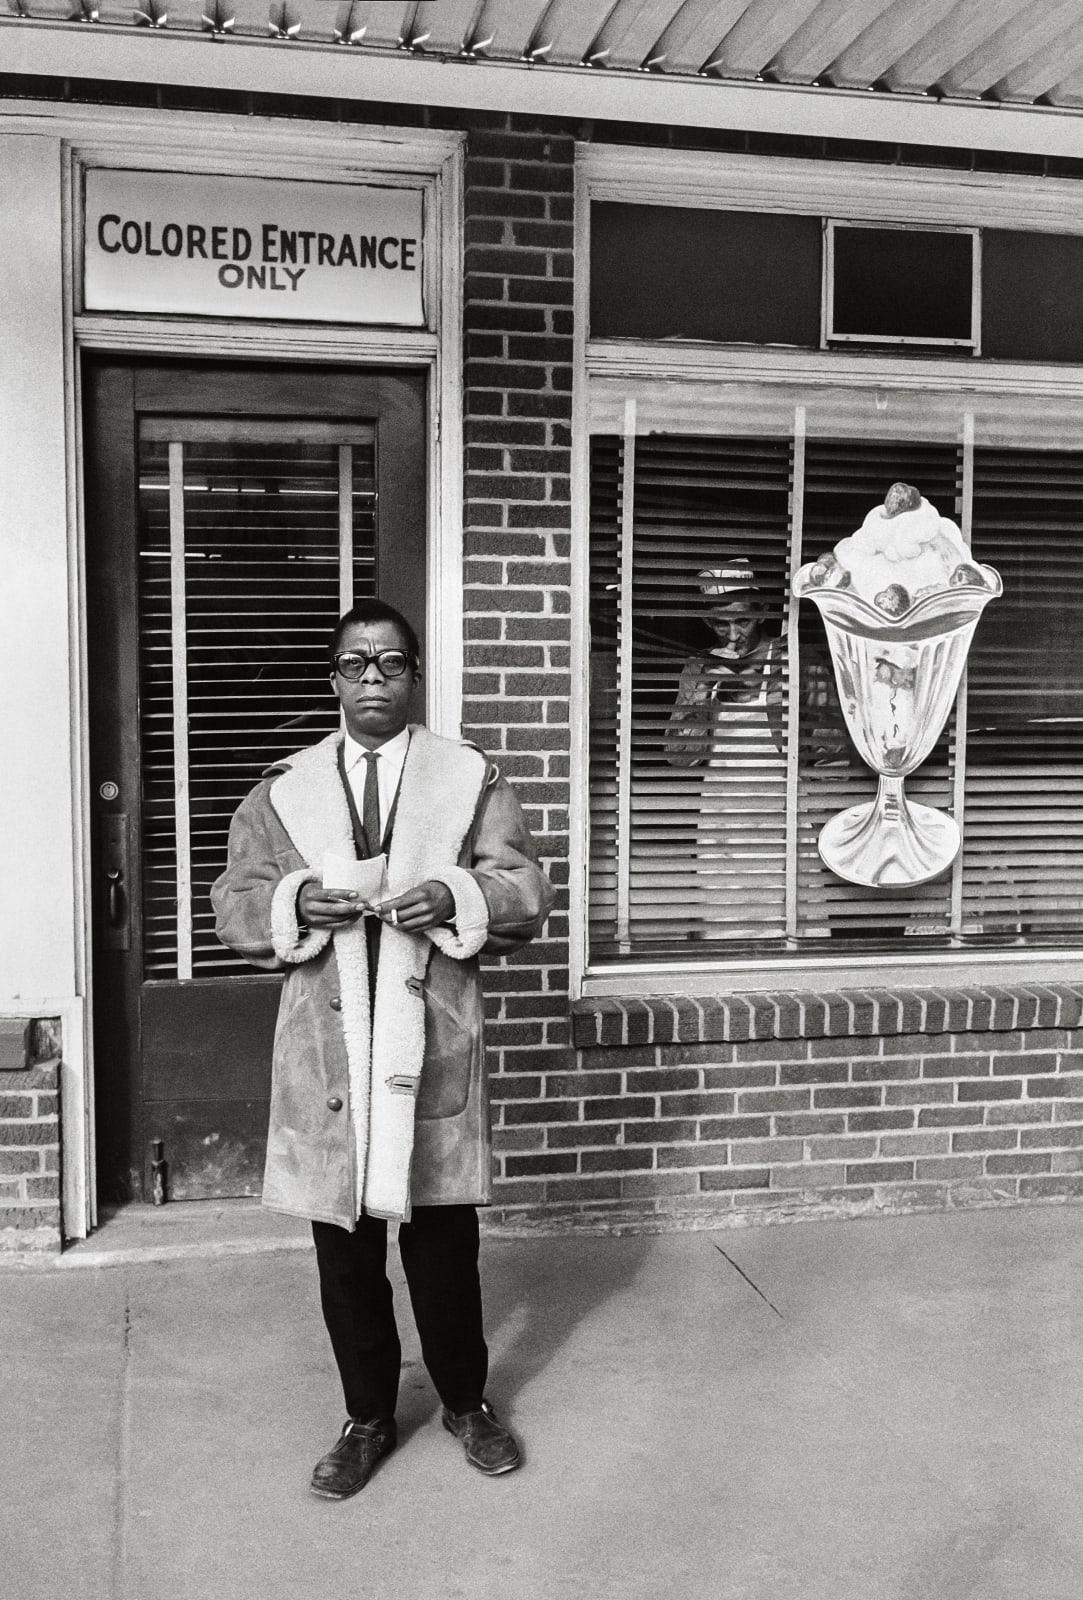 Steve Schapiro James Baldwin, Colored Entrance Only, Durham, North Carolina, 1963